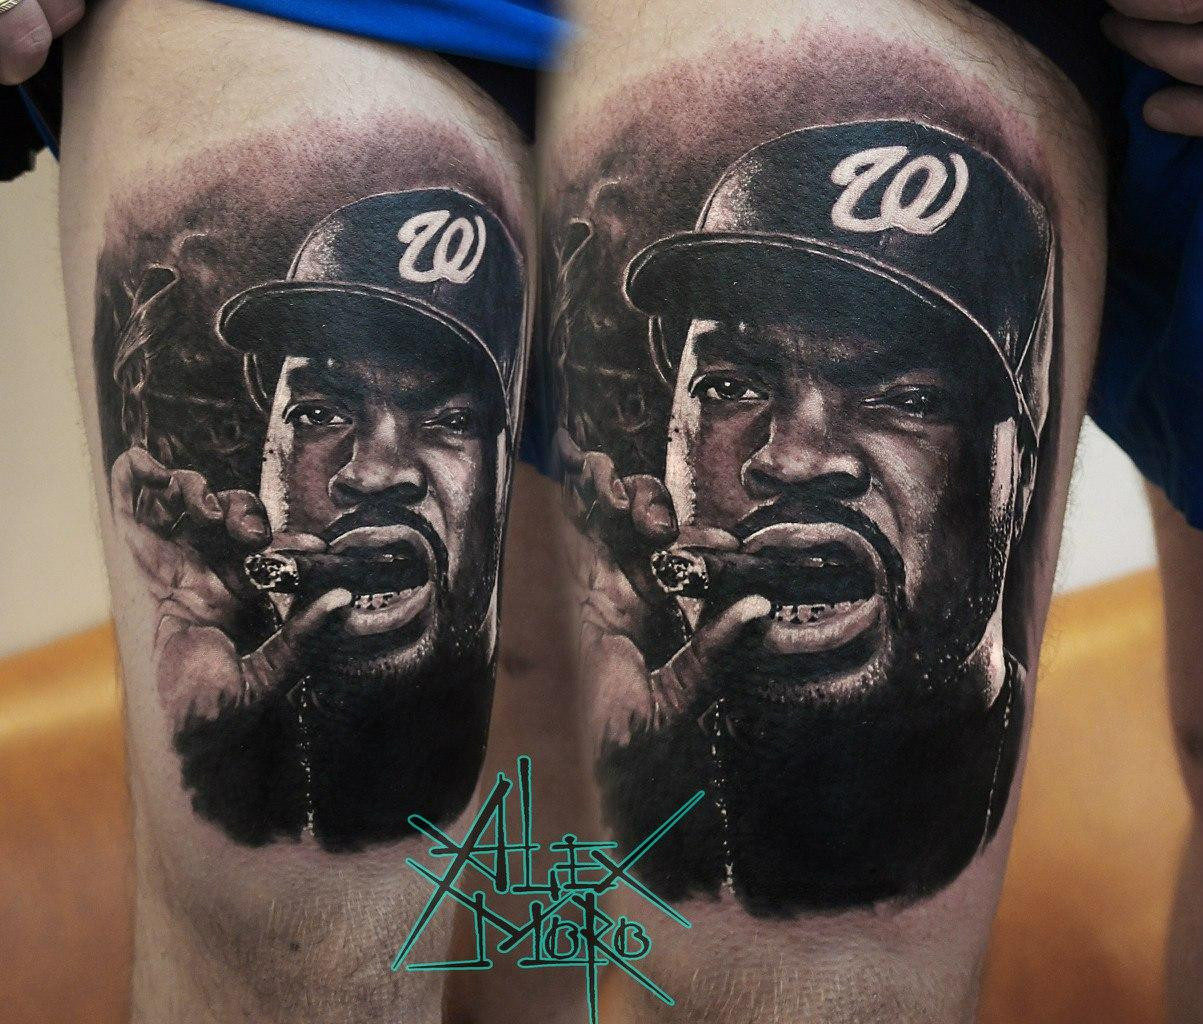 Портрет Ice Cube. Best of the day на II Уральском Фестивале Искусства Татуировки